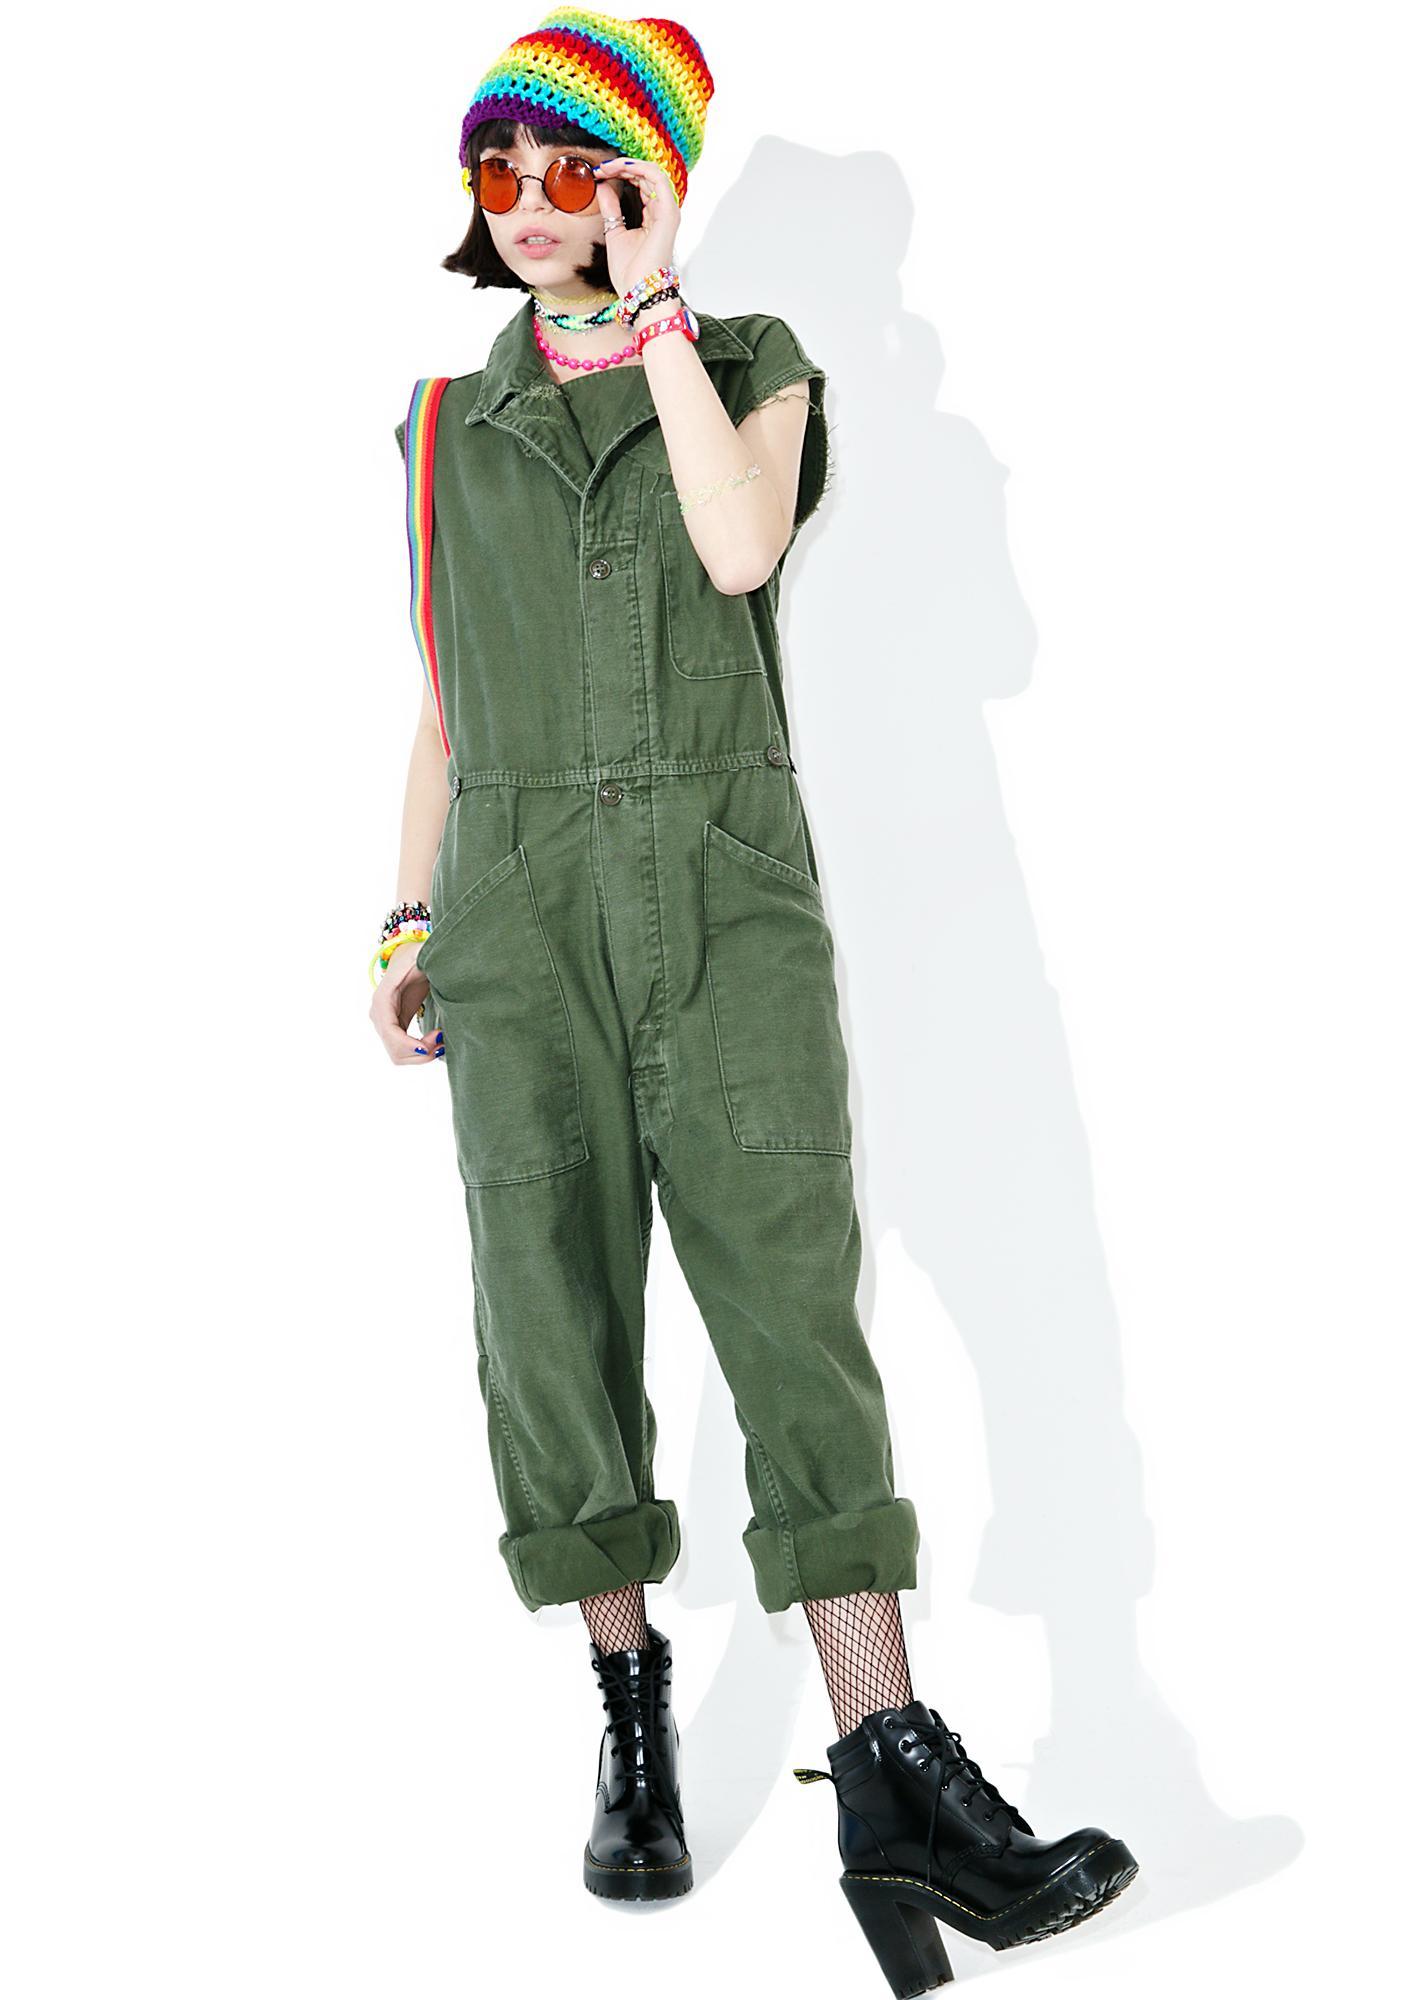 Vintage Army Surplus Sleeveless Flightsuit